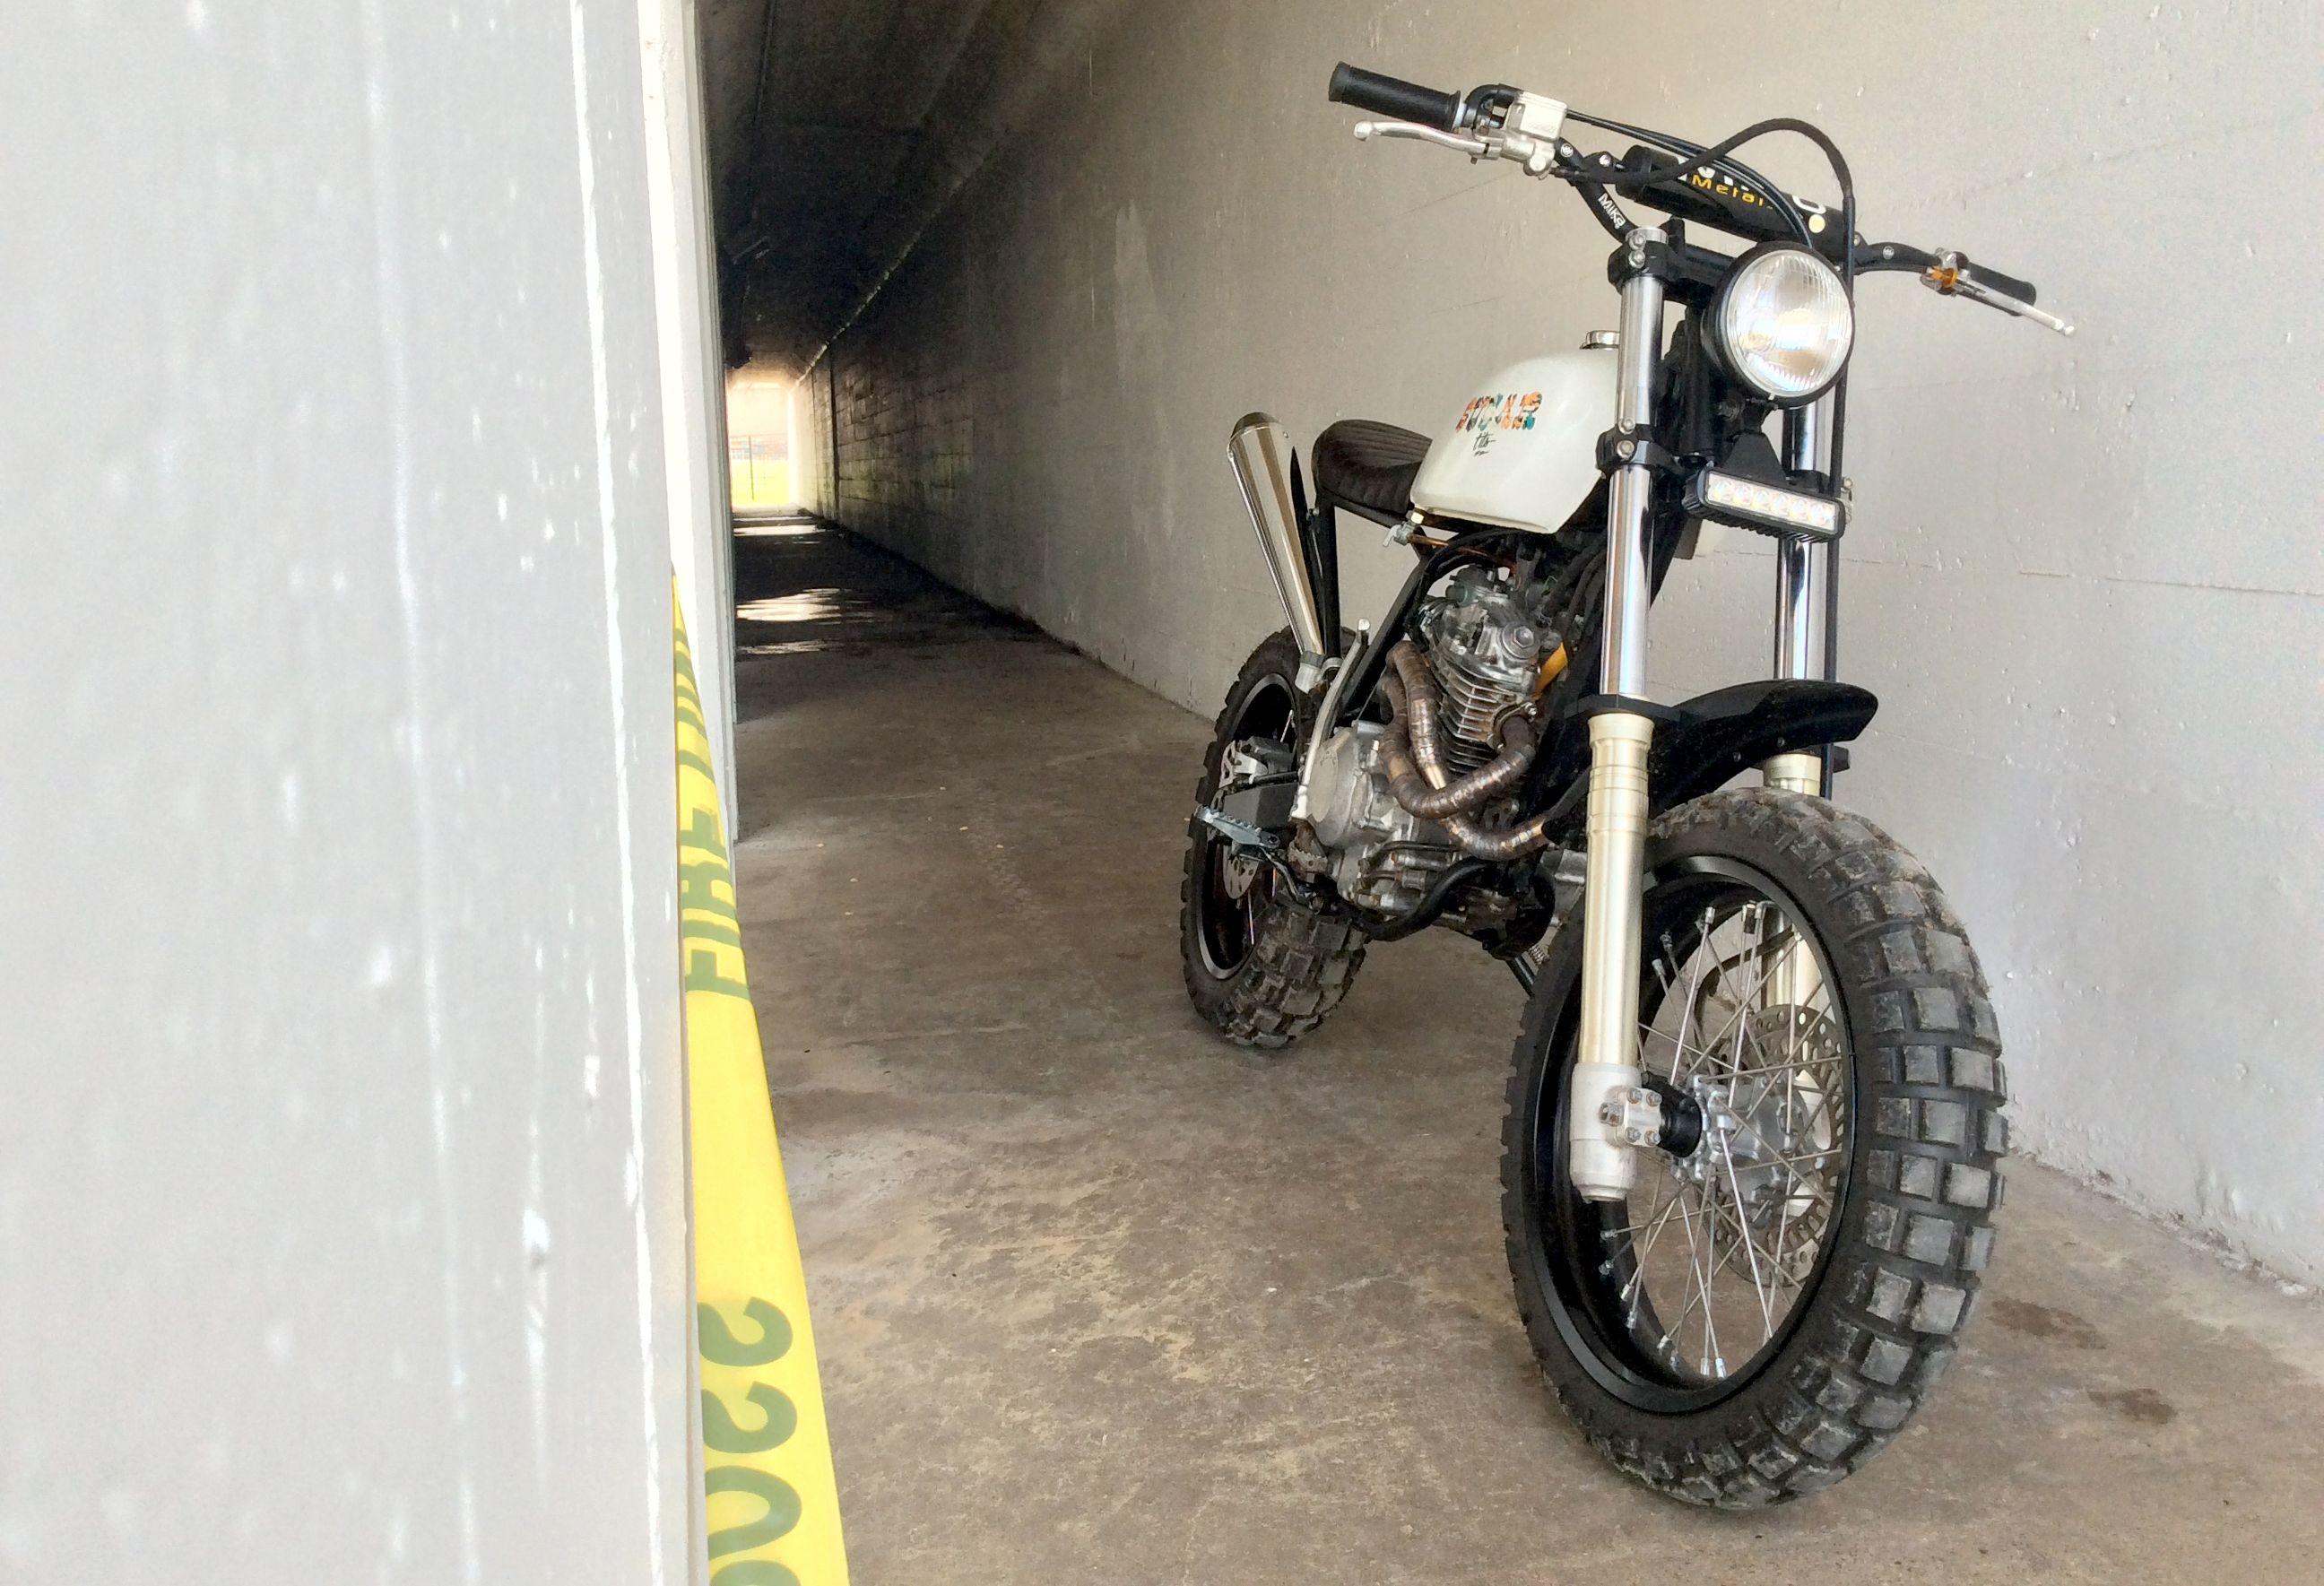 Hondaxrbuild Scrambler Tracker Xr250 Street Tracker Custom Build Motorcycle Dirt Bike Honda Cafe Racer Cafe Style Custom Motorcycles Scrambler